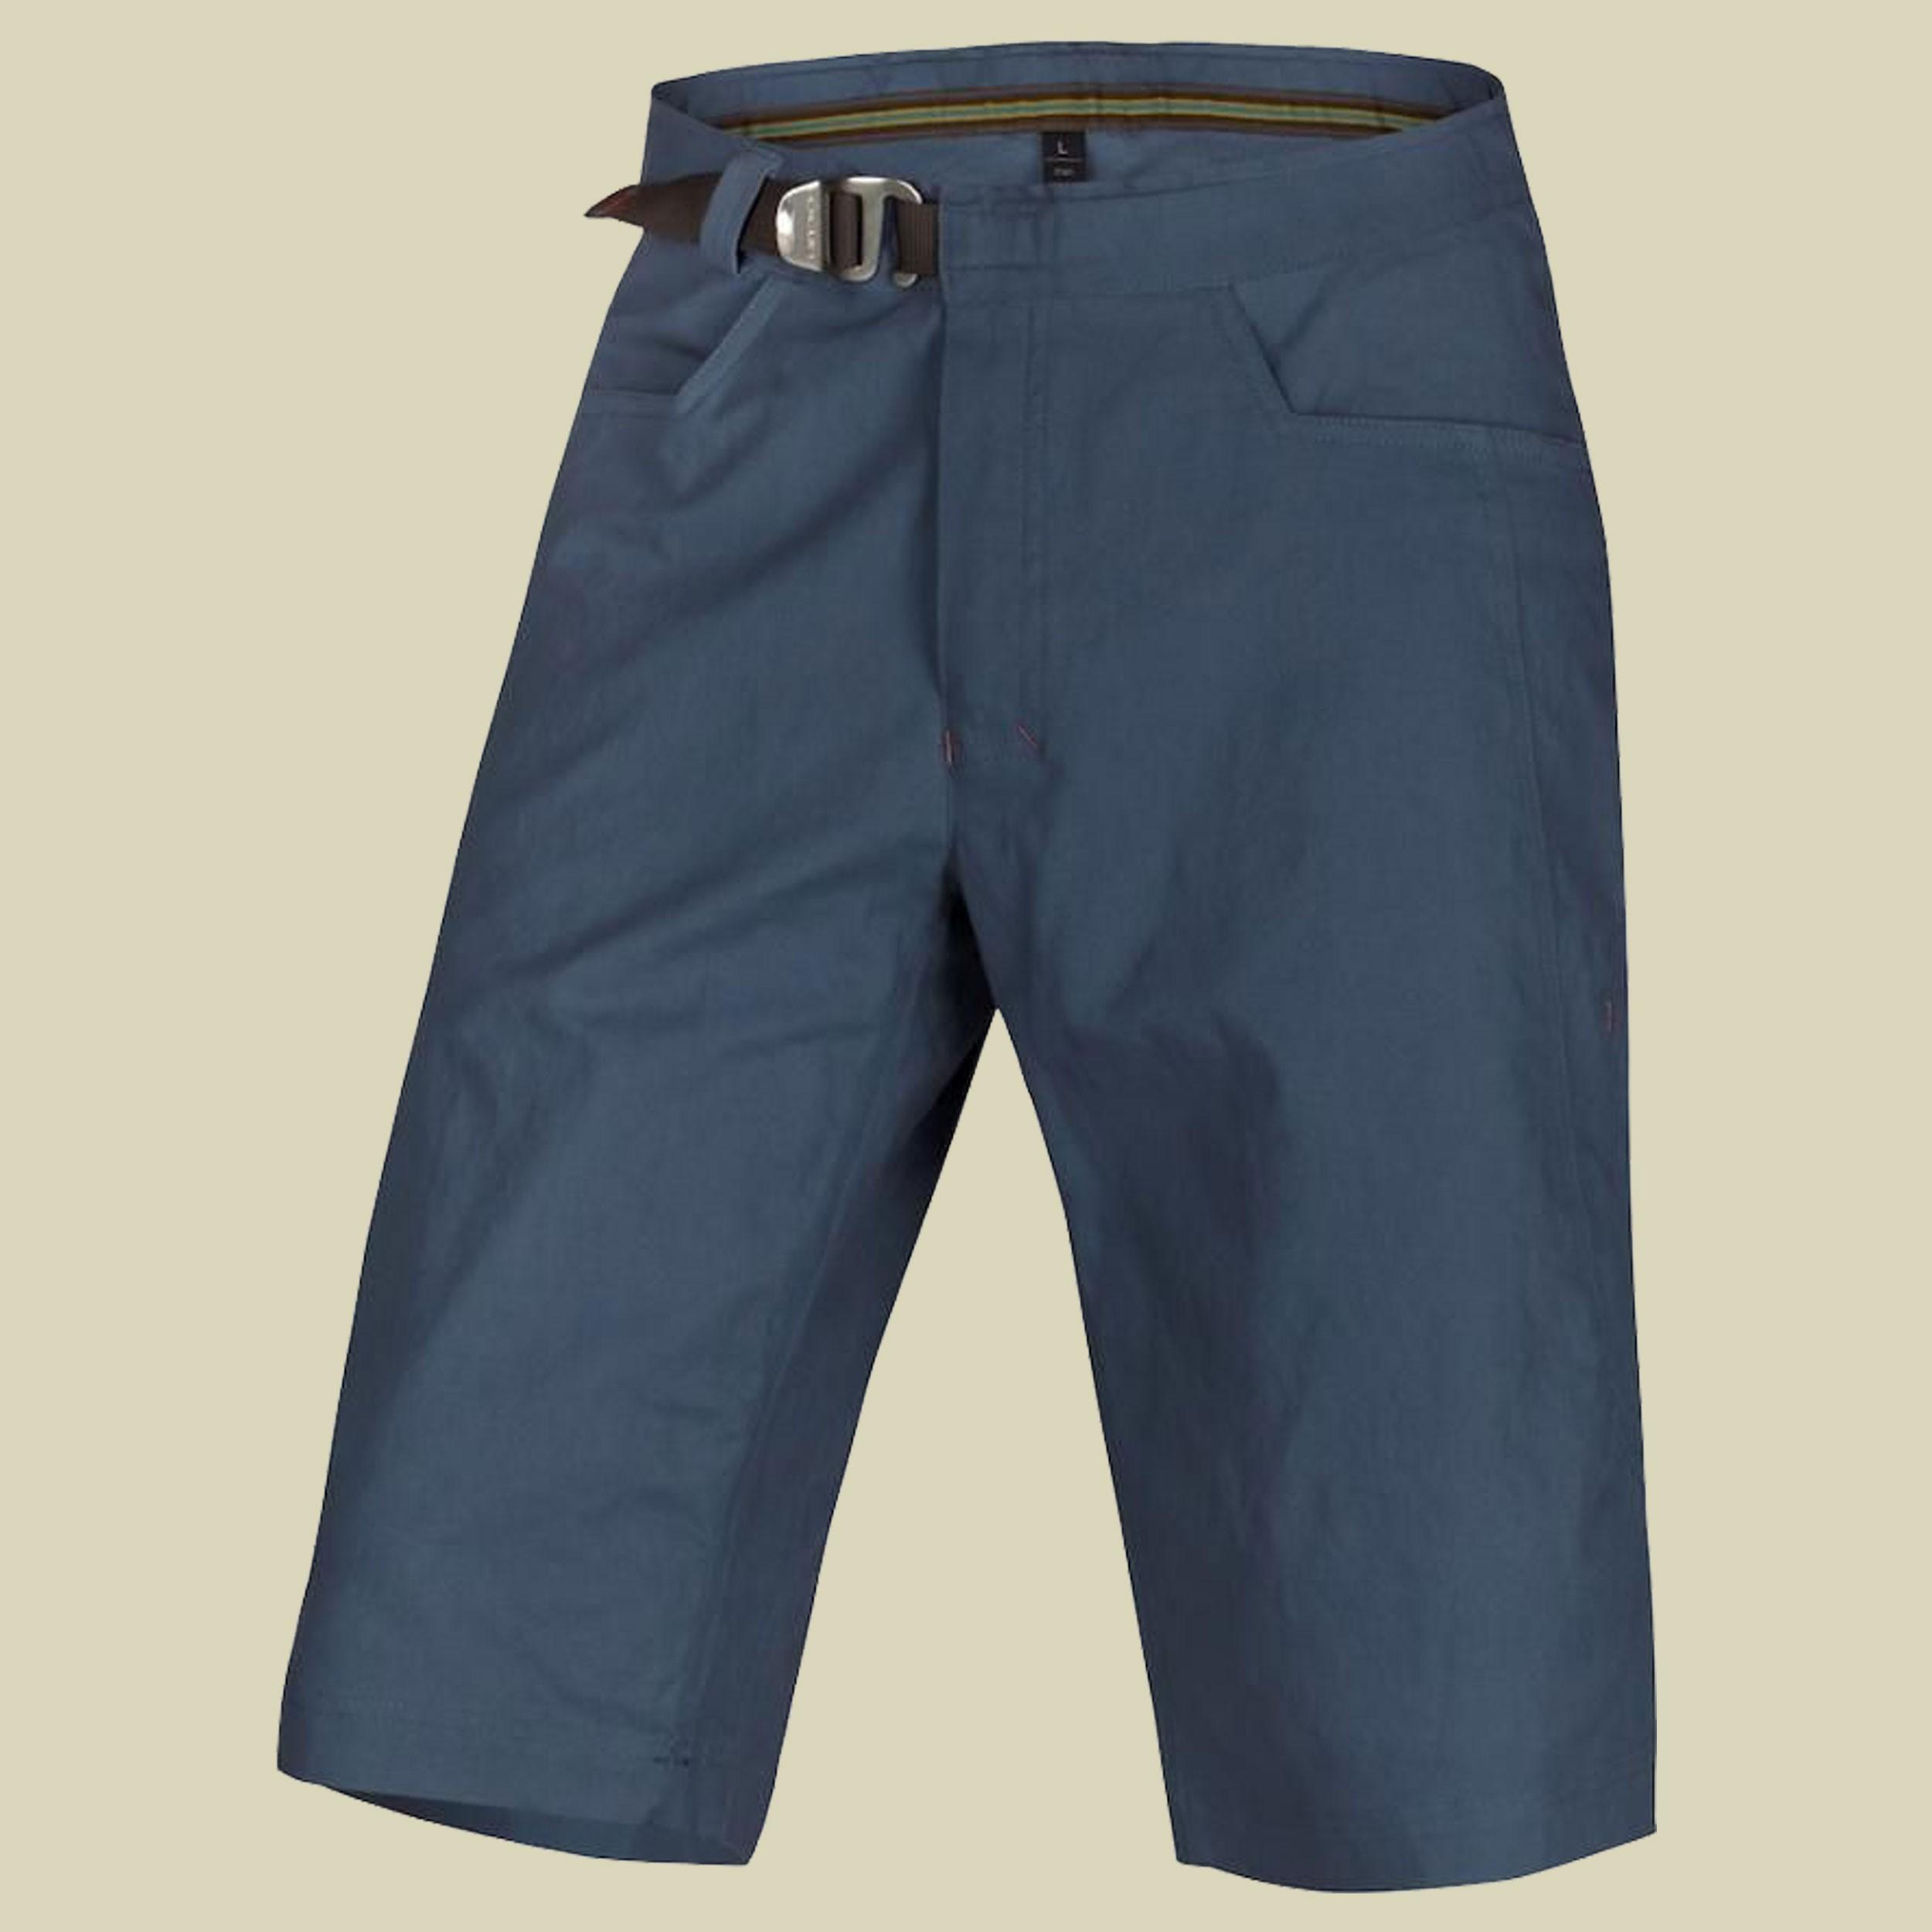 Honk Shorts Men